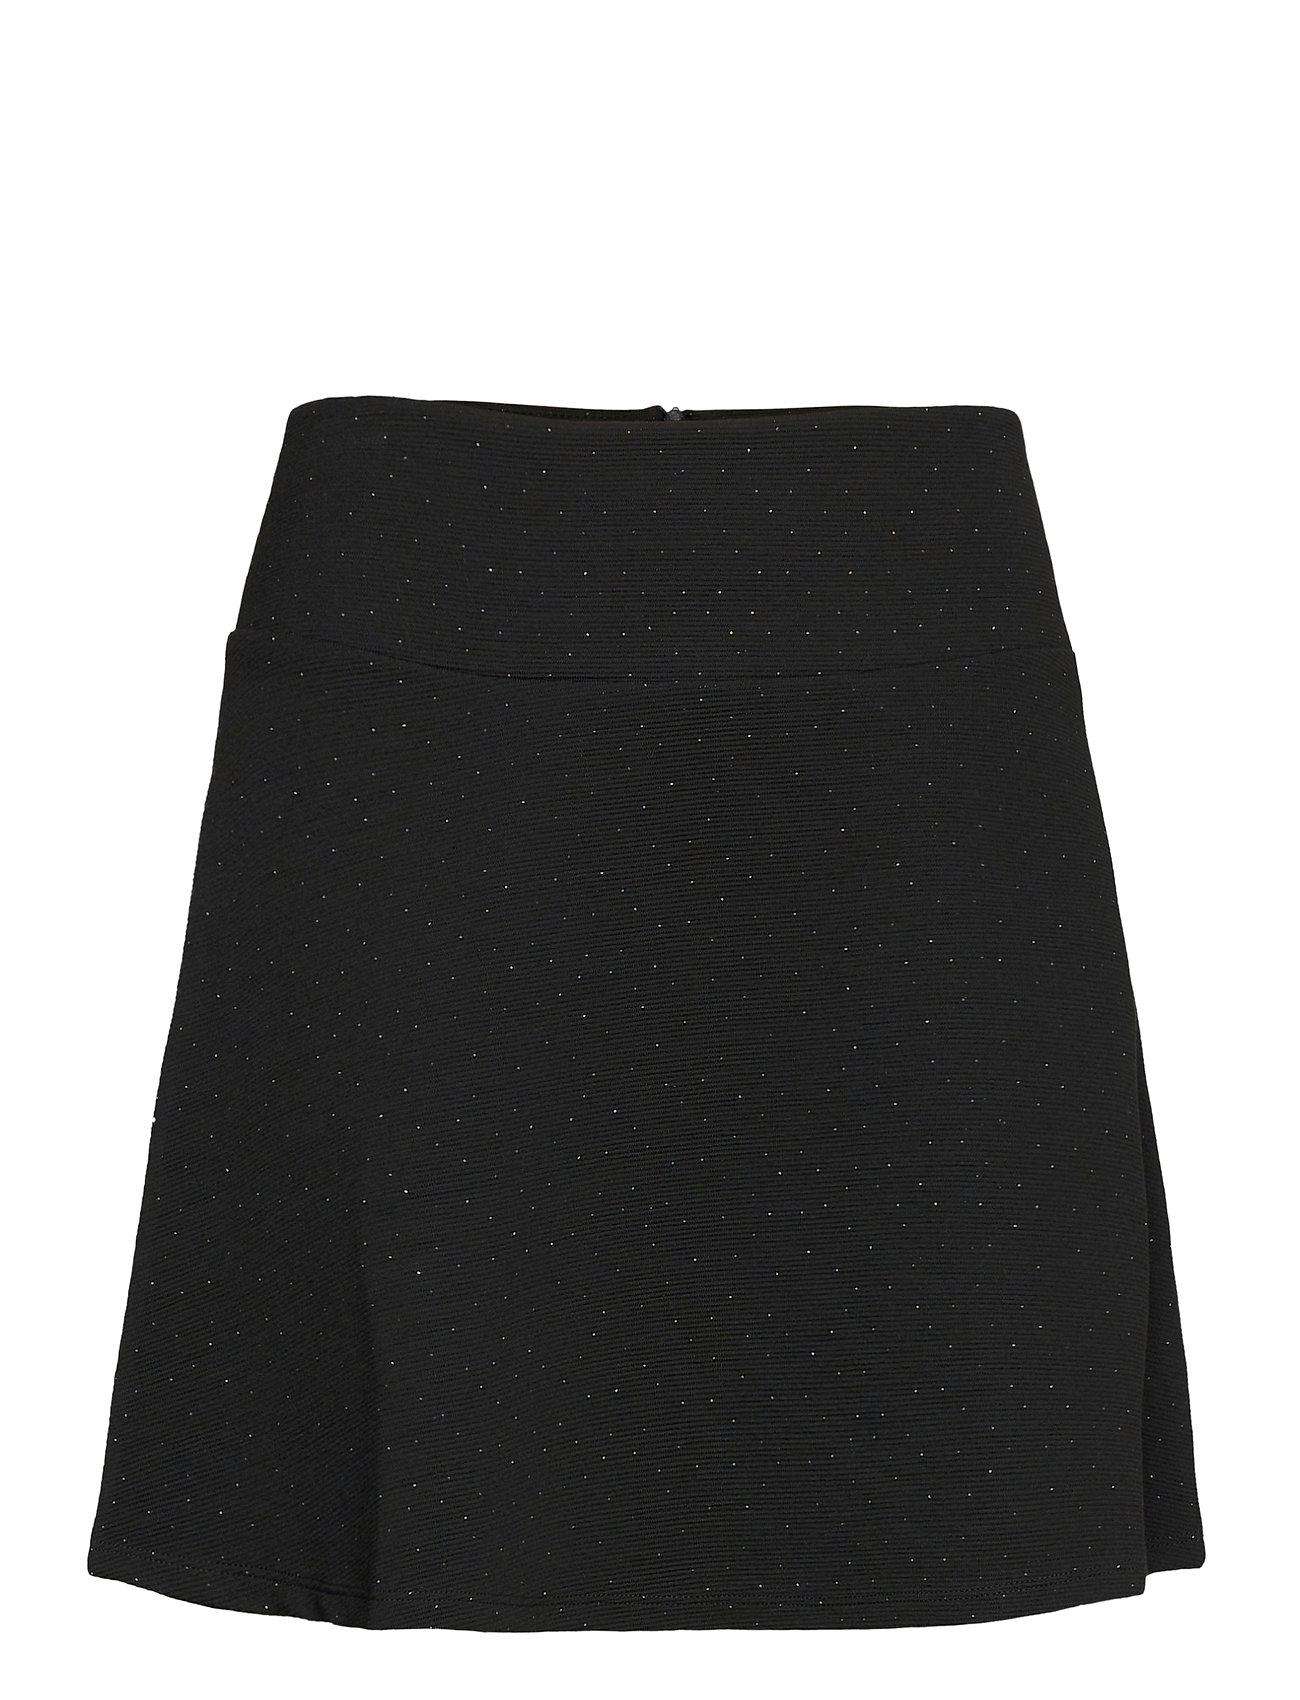 Image of Skirts Knitted Kort Nederdel Sort EDC By Esprit (3468422783)